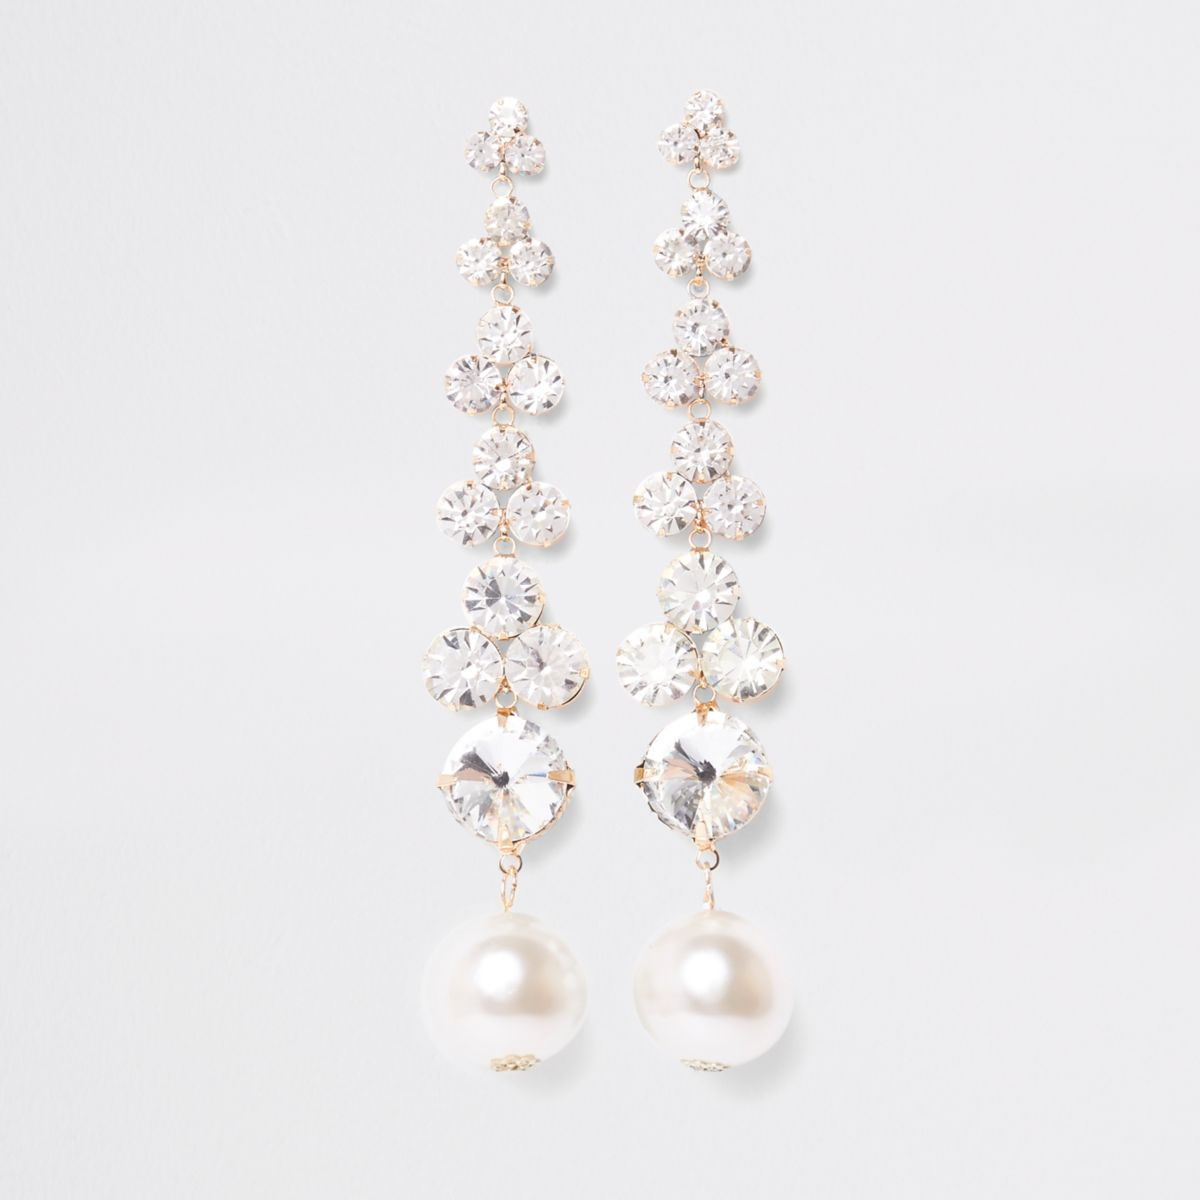 Gold tone rhinestone pearl drop earrings